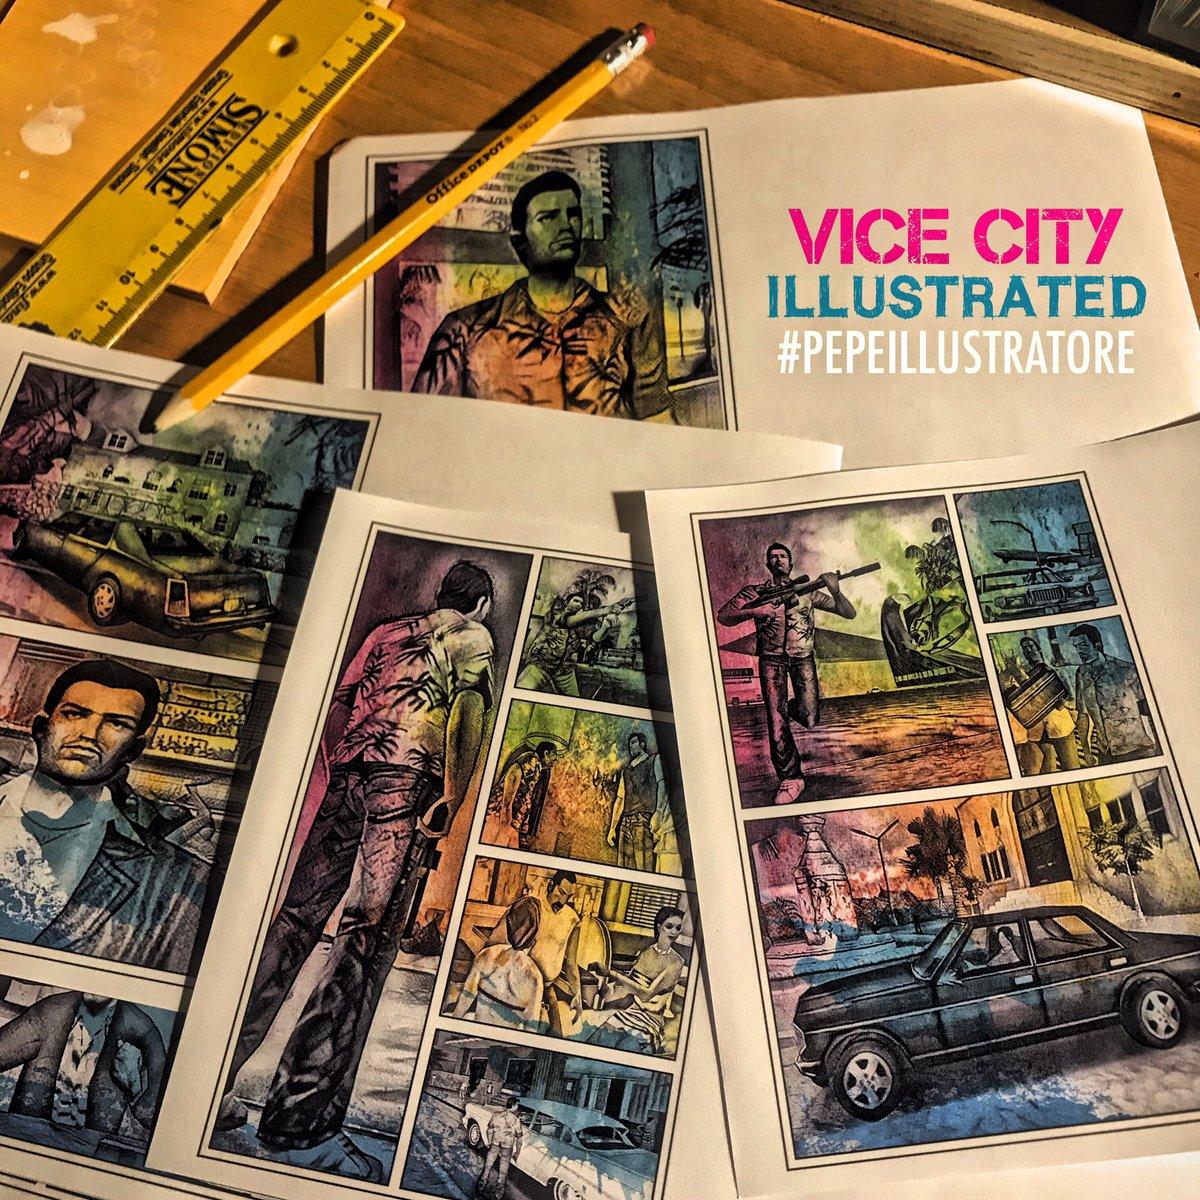 VICE CITY ILLUSTRATED Sketchbook Illustrations Collection #gta #maionese #illustrator #art #popart #book #color  #vercetti #graphic #miami #vicecity #pepeillustratore #gtavicecity #love #moleskine #rockstargames #auto #grandtheftauto #miamivice pic.twitter.com/Gmg2wPC733